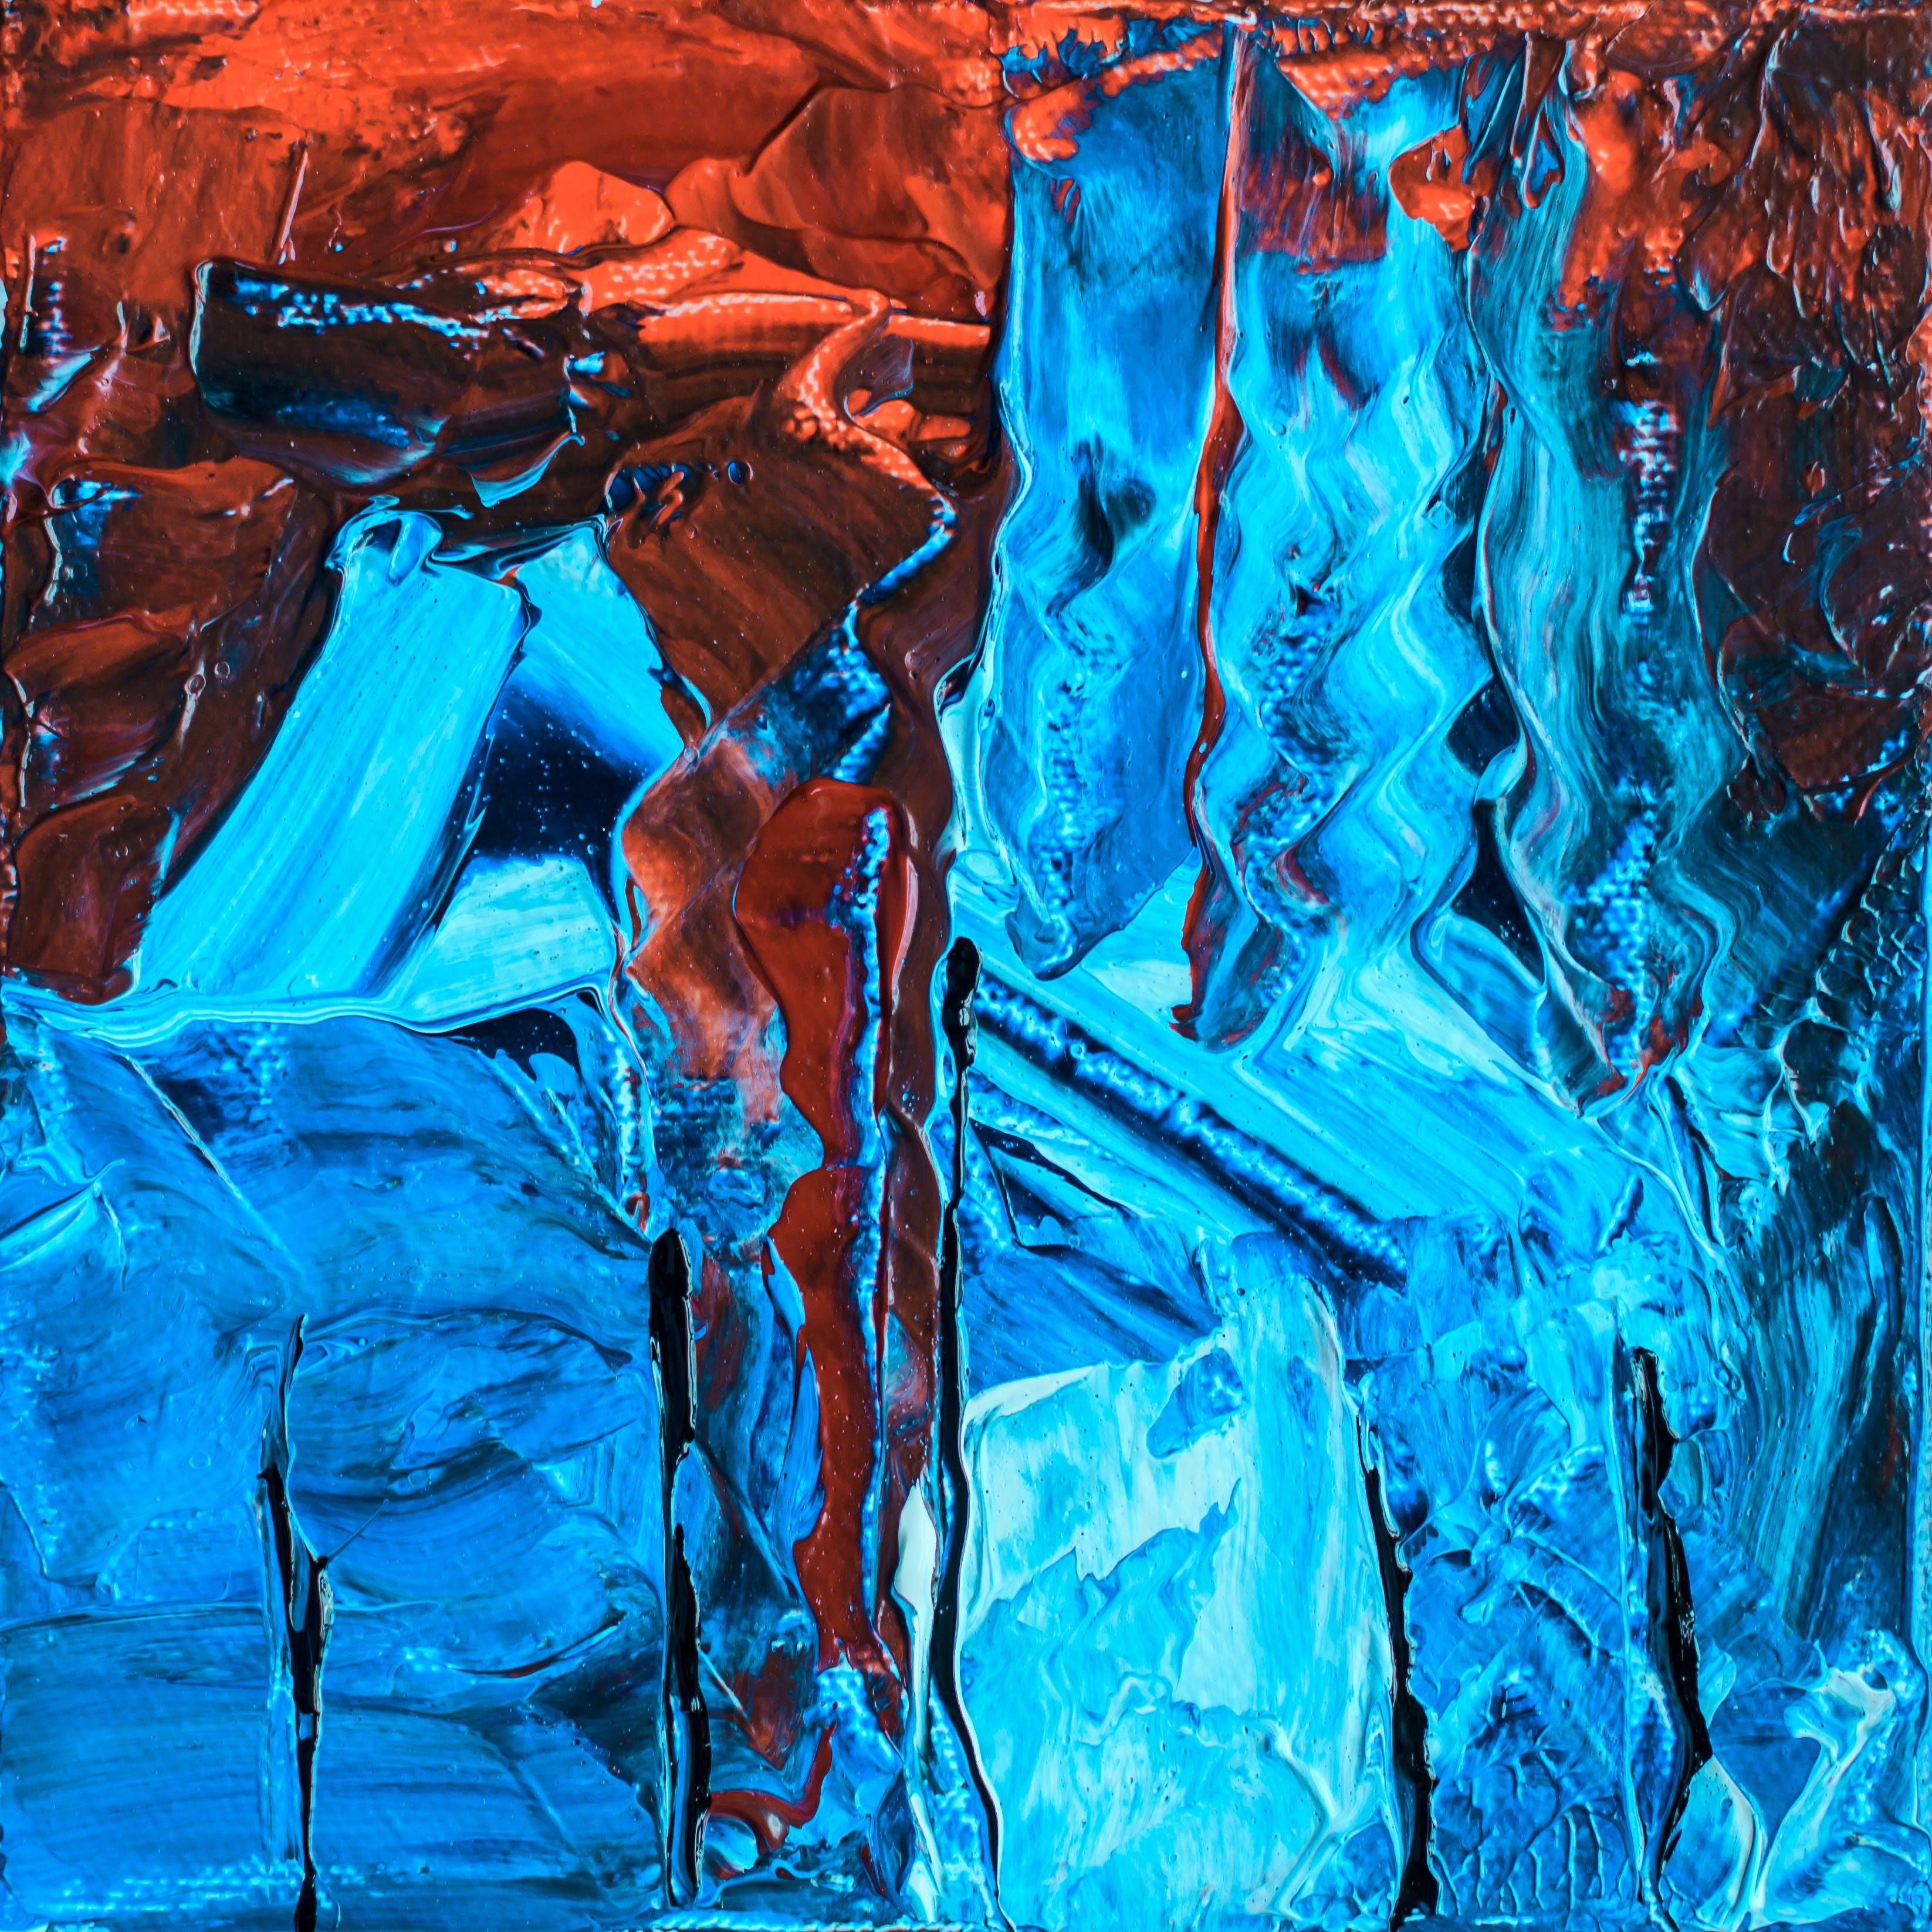 Kostenloses Stock Foto zu abstrakt, abstrakte kunst, abstraktes gemälde, acryl